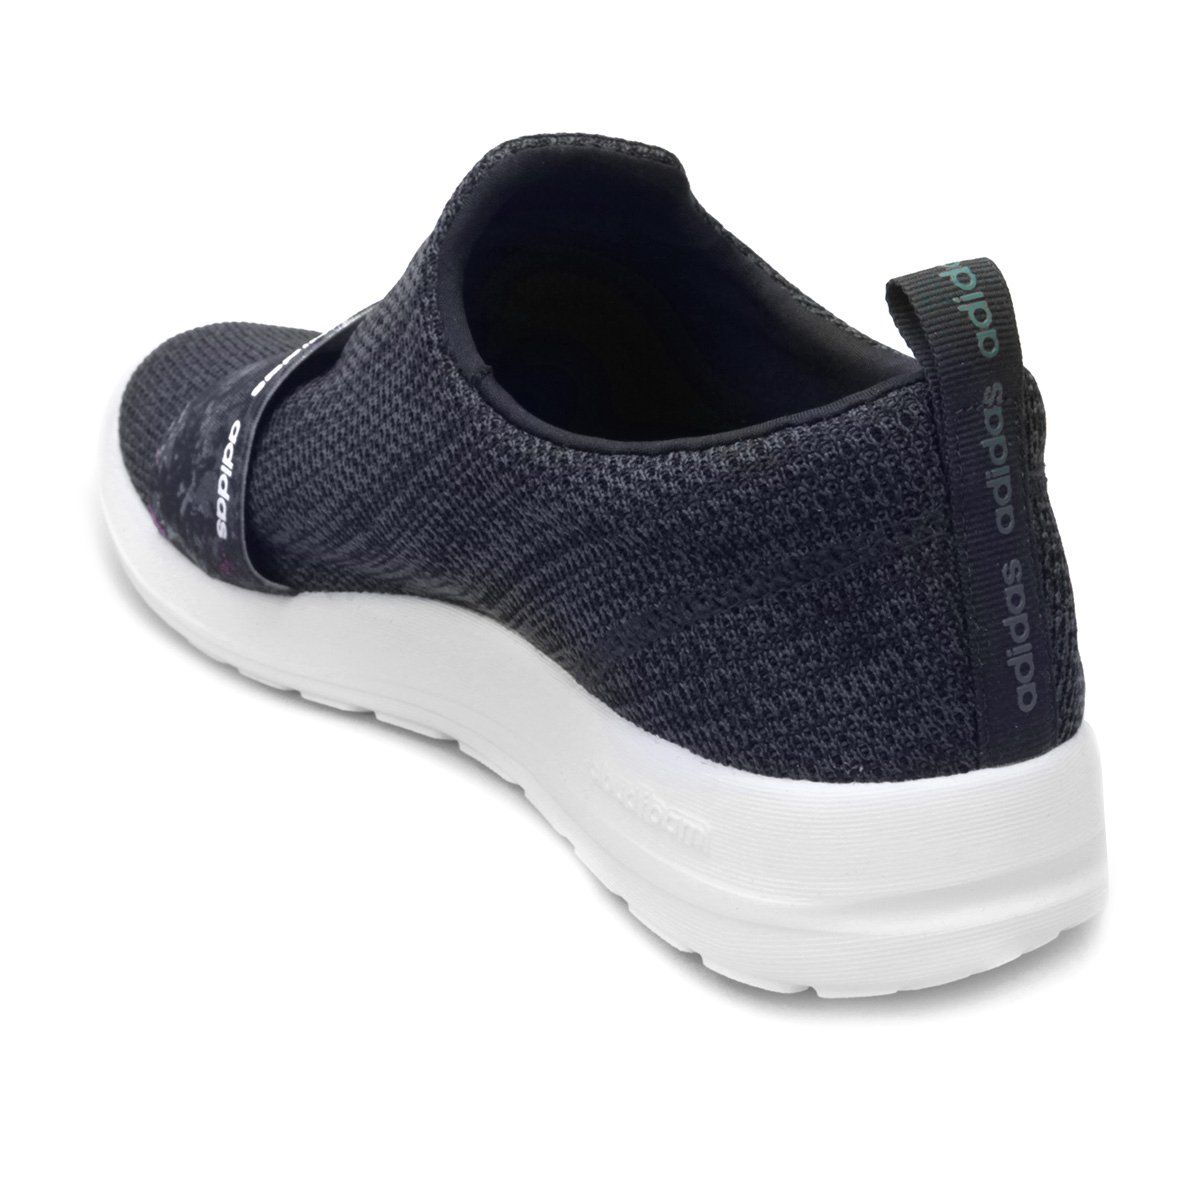 9f0ee79aa58 Foto 2 - Tênis Adidas Cf Refine Adapt Feminino